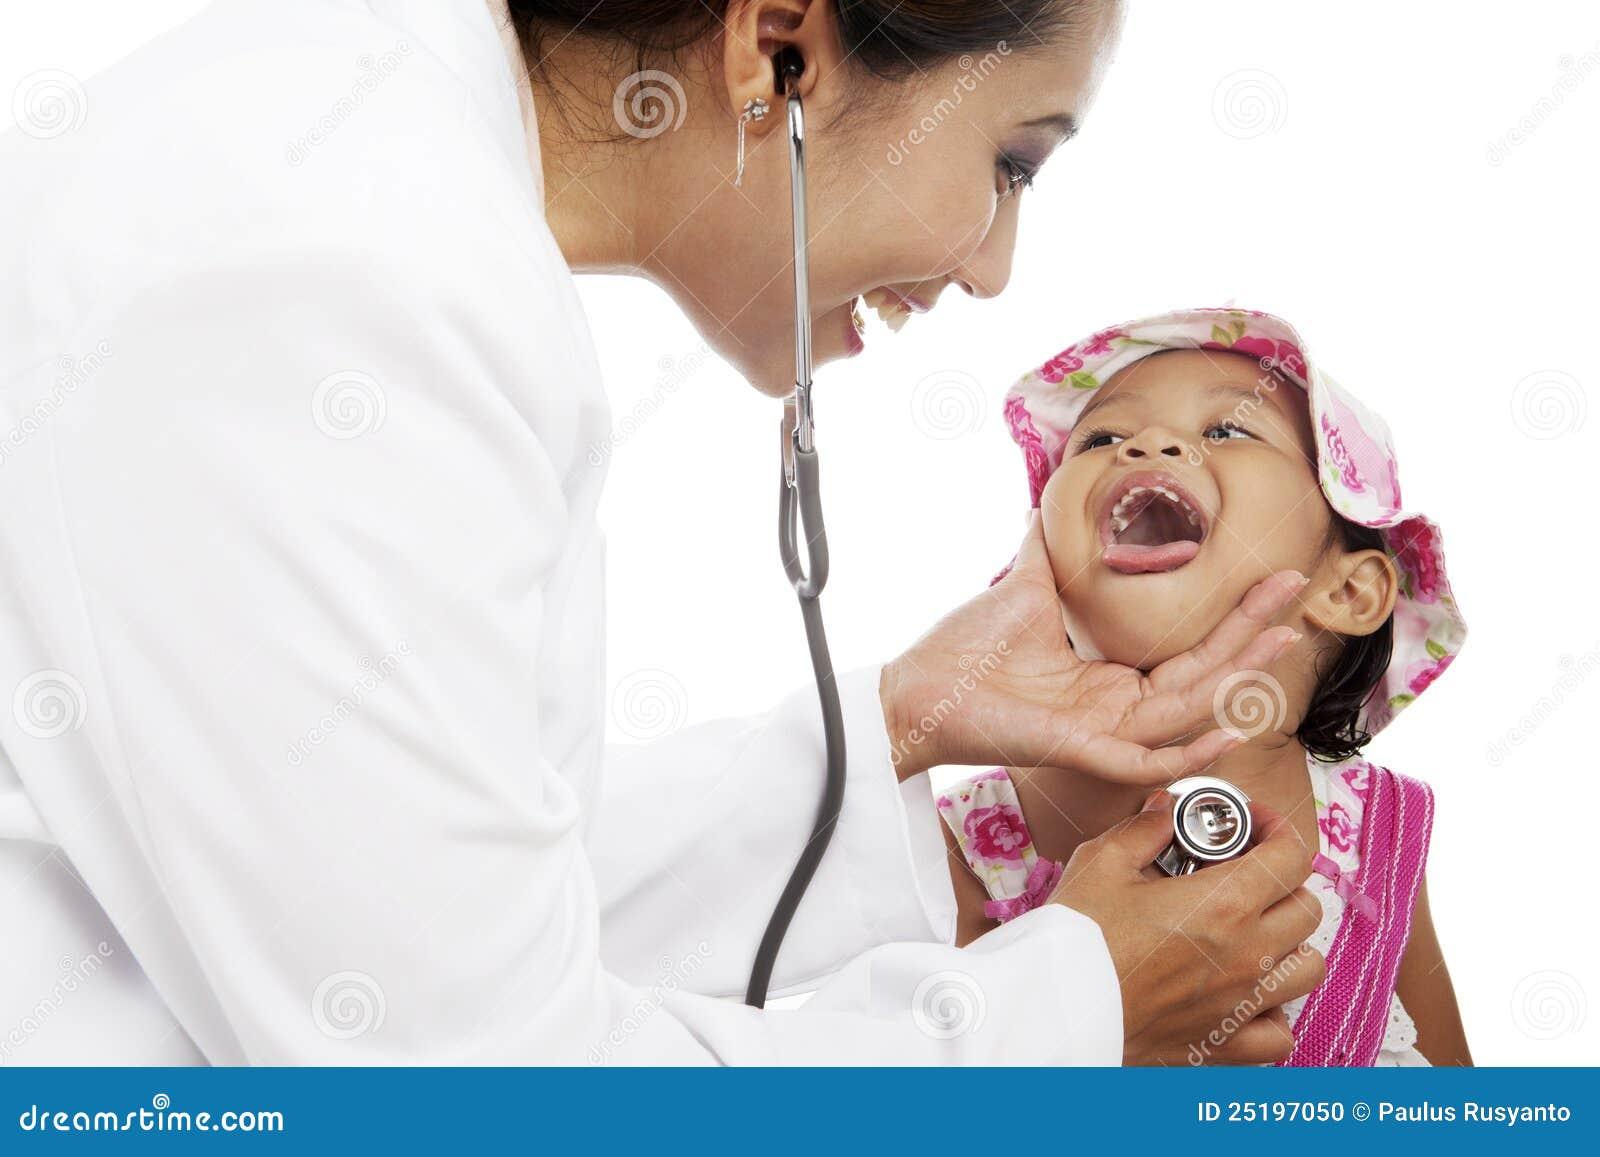 Female doctor examining little child boy — Stock Photo